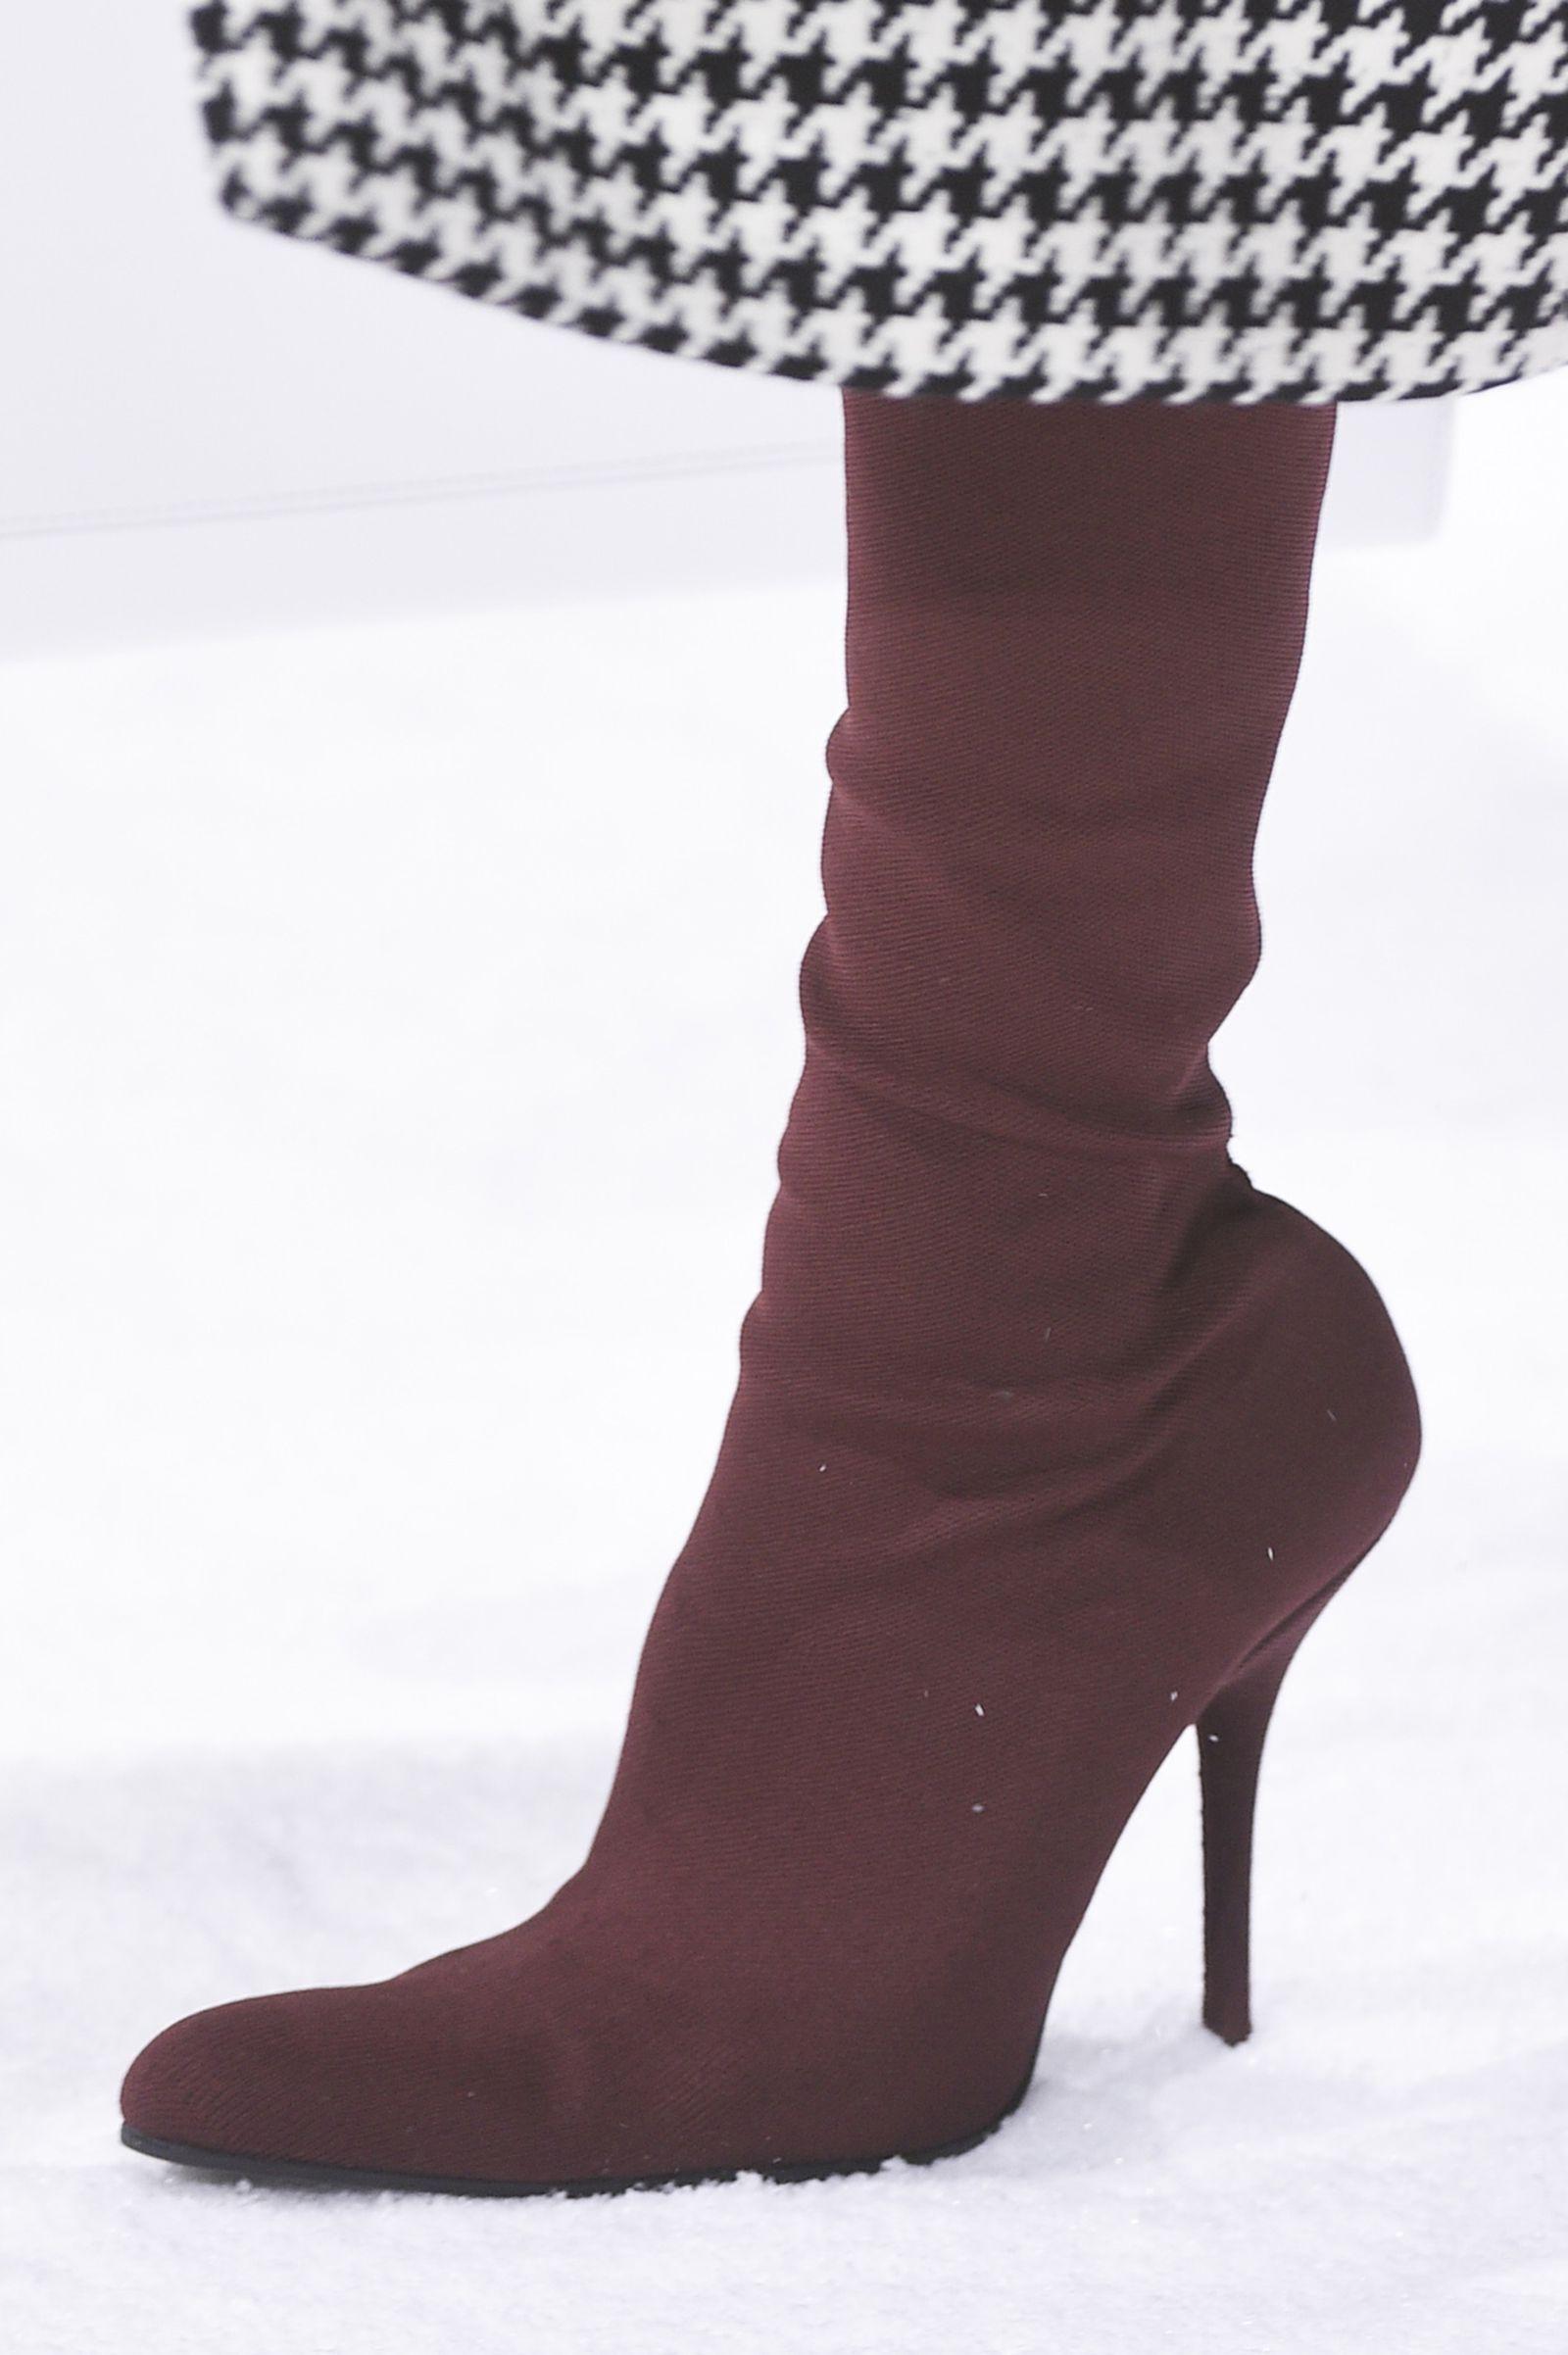 7c7e6e36ed0 Balenciaga- HarpersBAZAARUK Merrell Shoes, Cool Boots, Fall Season, Fashion  Boots, Fall